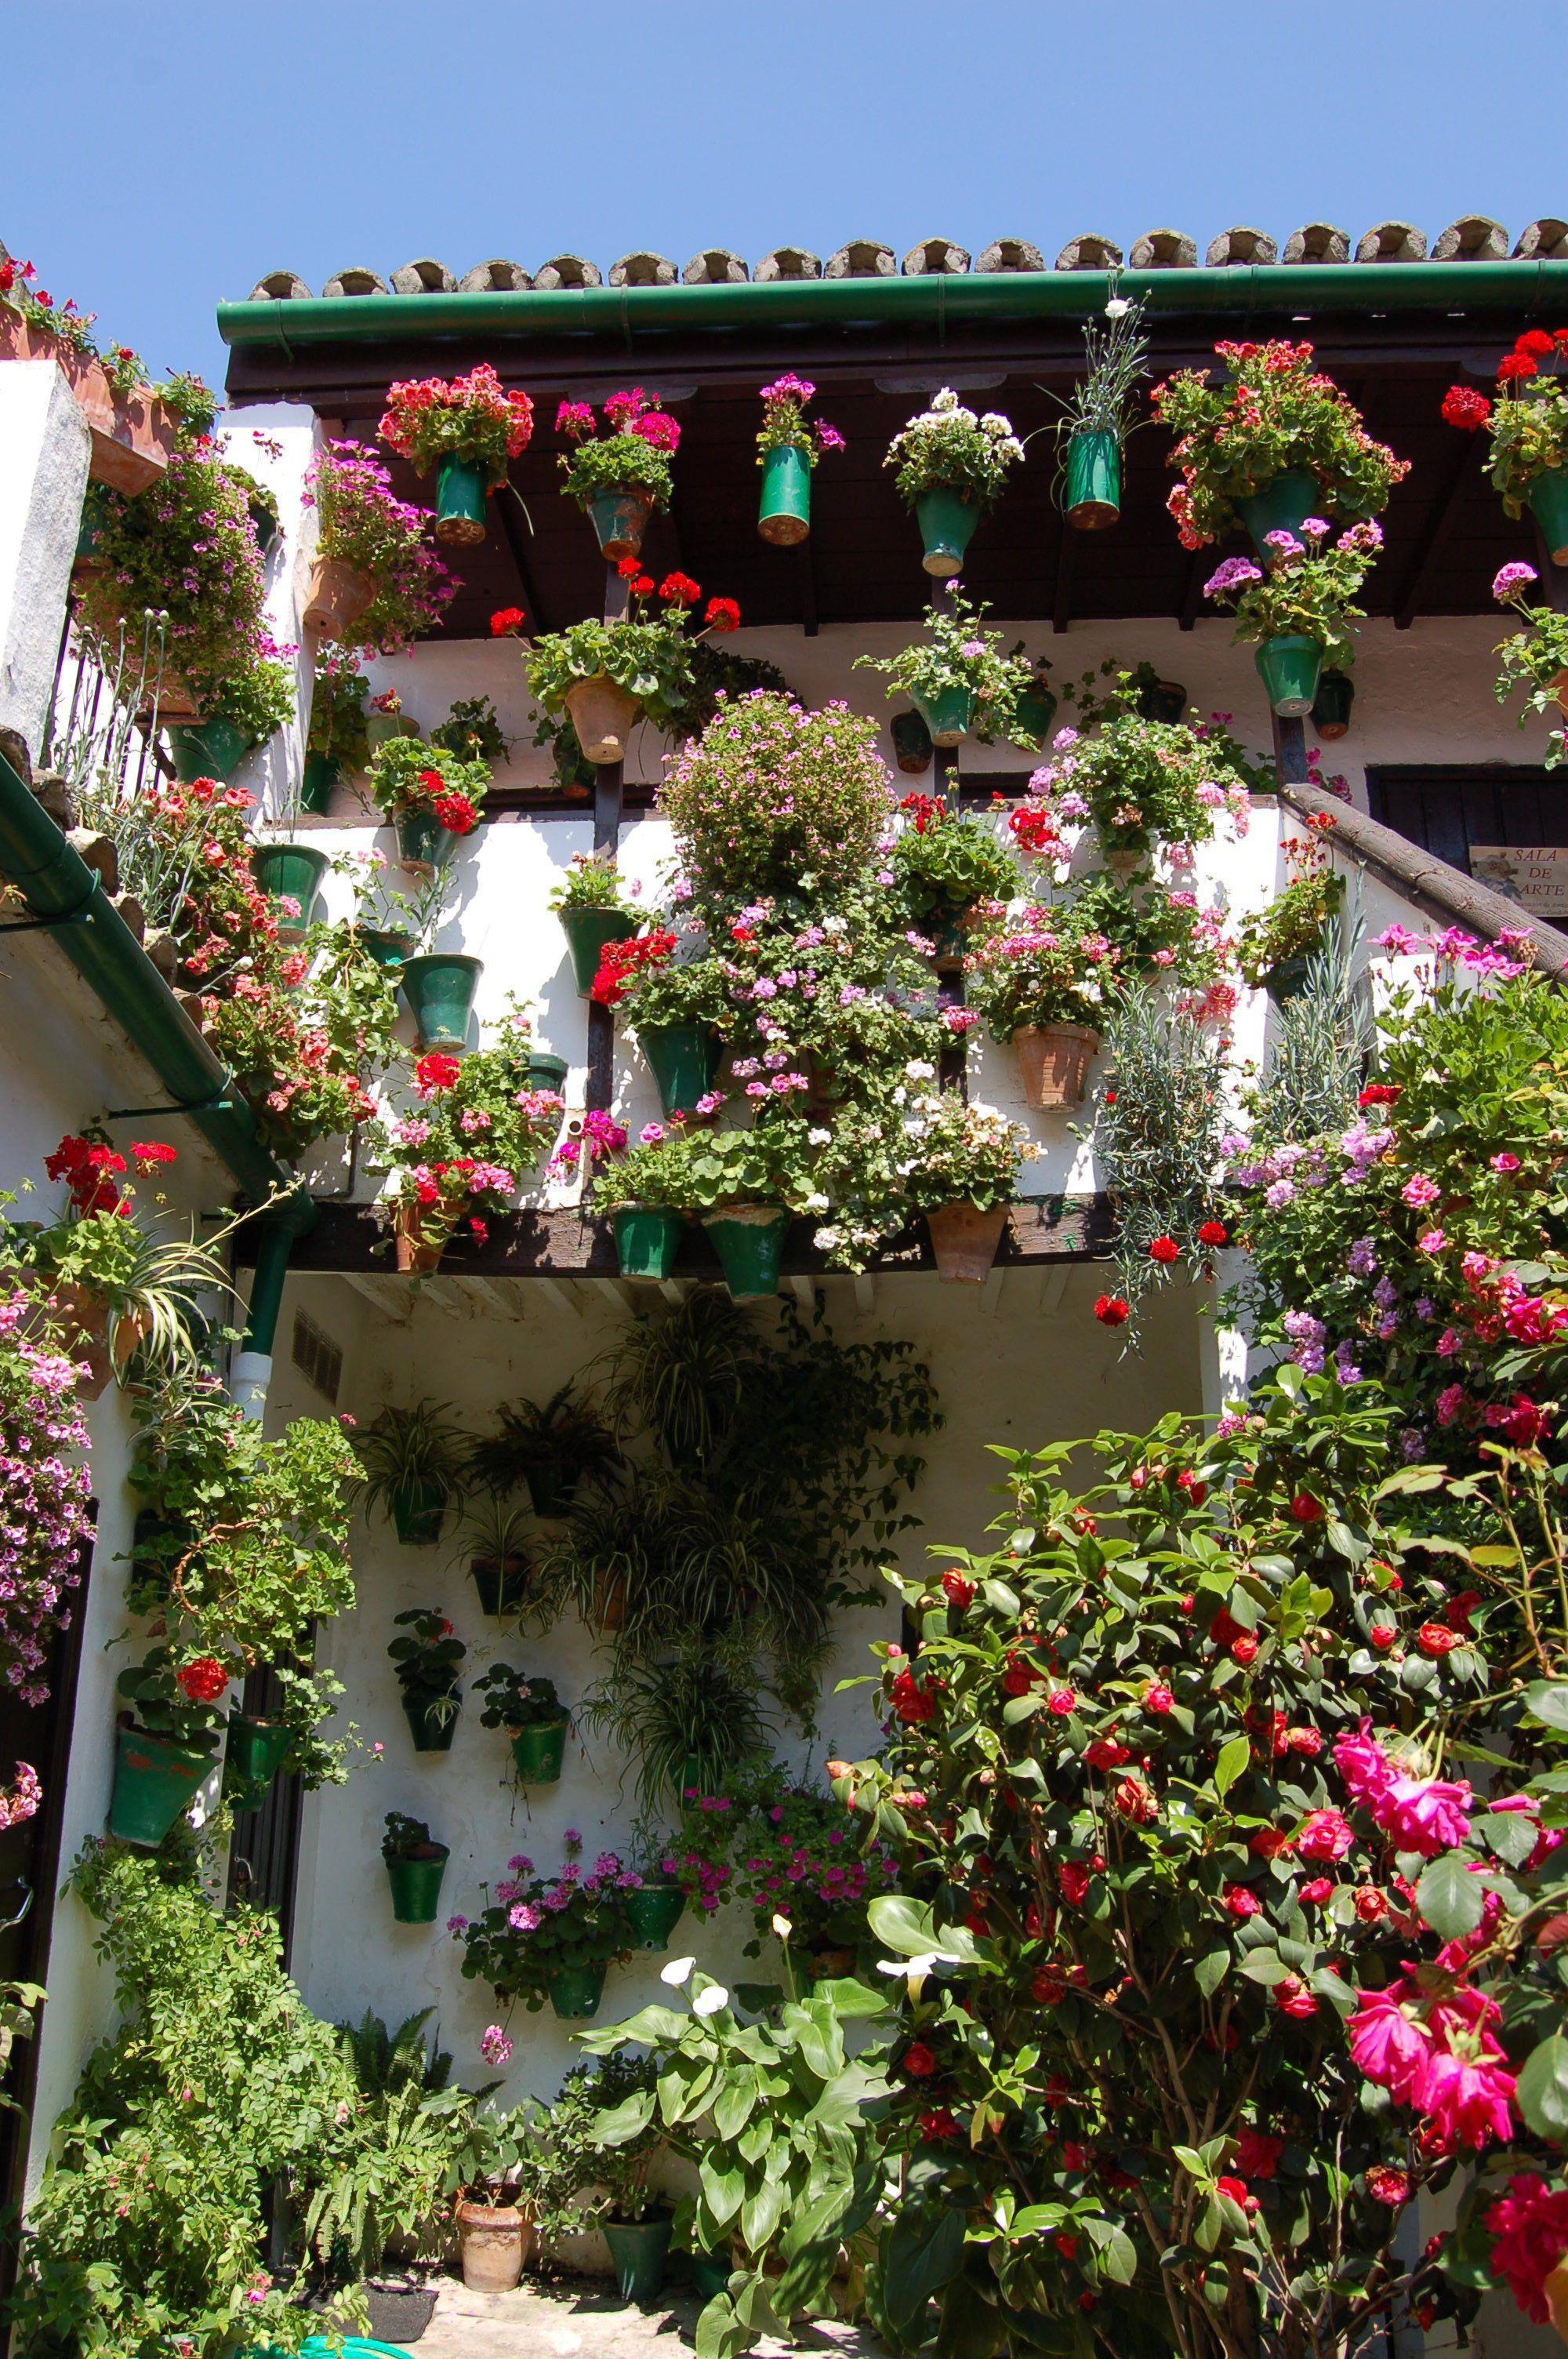 Cordoba, Spain | i love it here | Pinterest | Cordoba spain, Cordoba ...